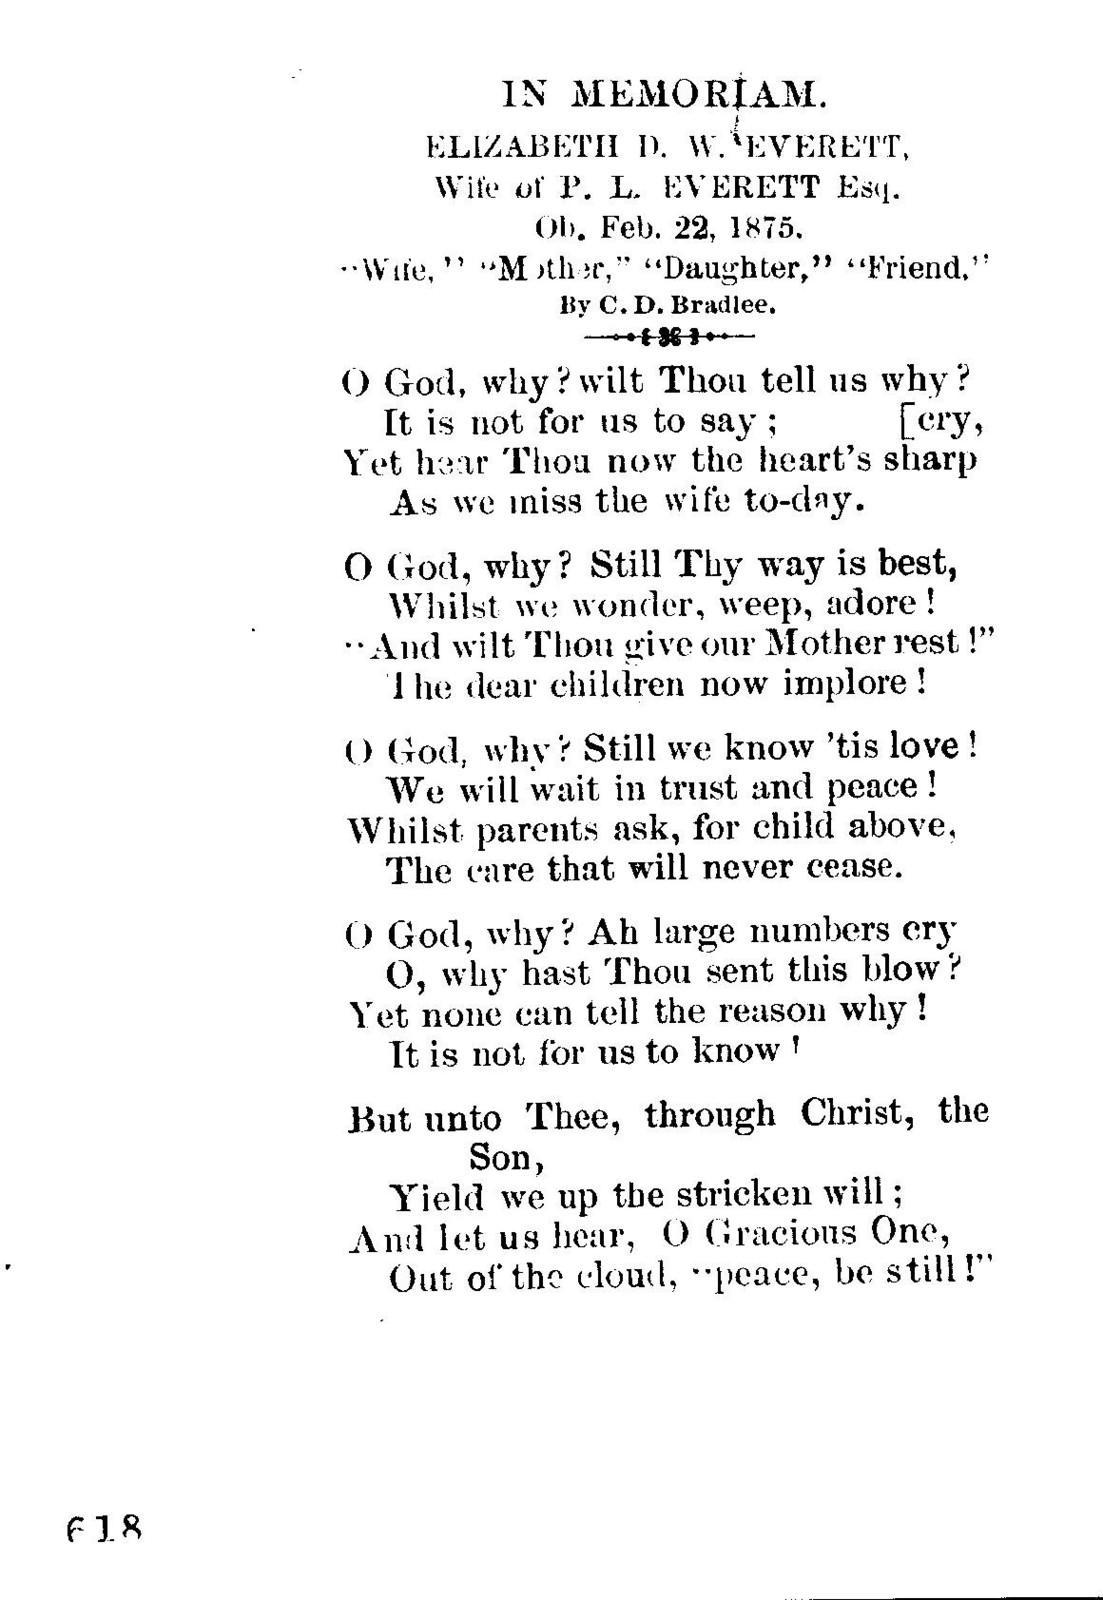 "In memoriam. Elizabeth D. W. Everett, wife of P. L. Everett Esq. Ob. Feb. 22, 1875. ""Wife,"" ""Mother,"" Daughter,"" ""Friend."" By C. D. Bradlee"